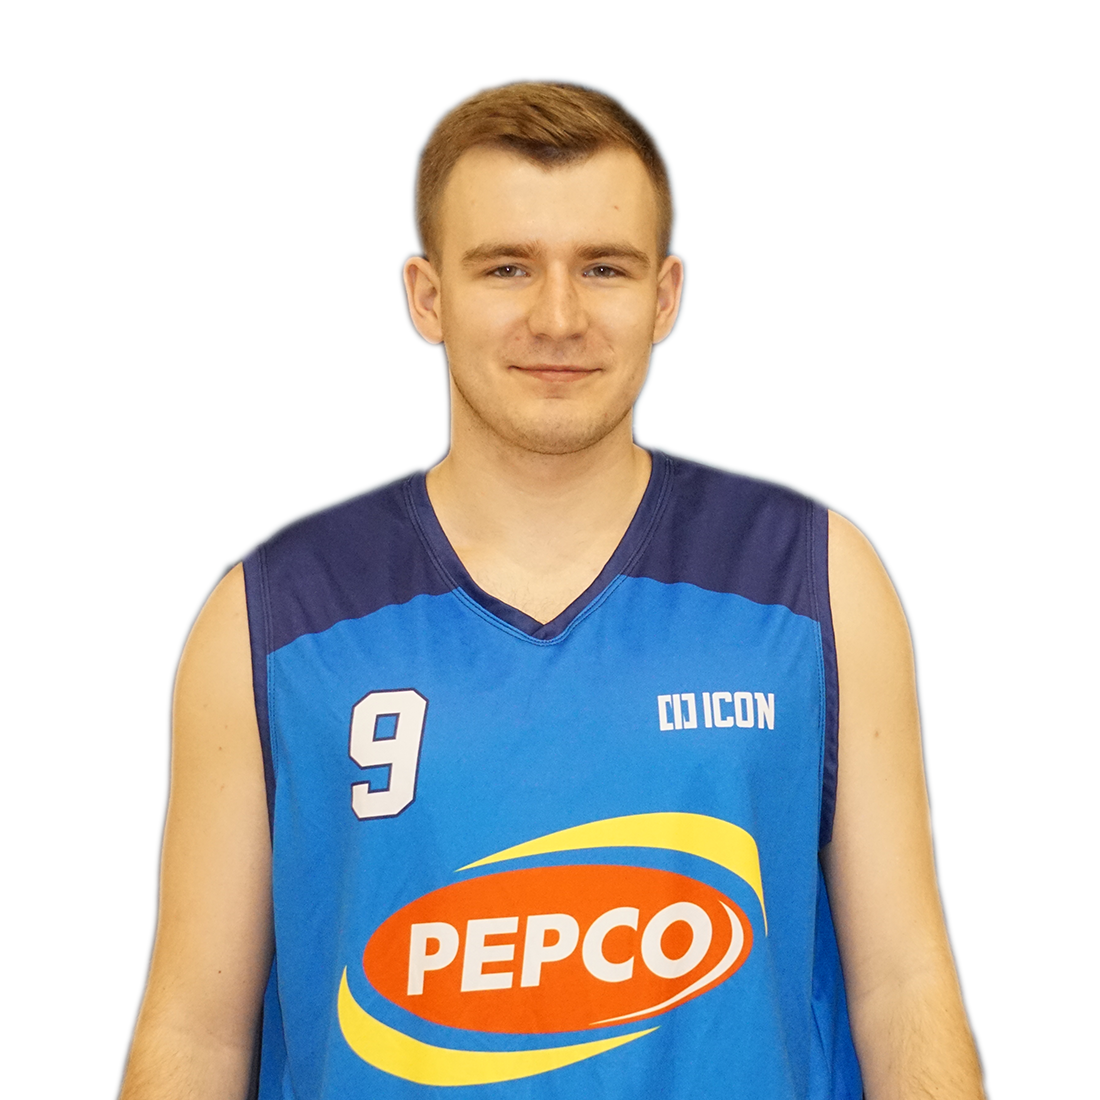 Igor Kopacki